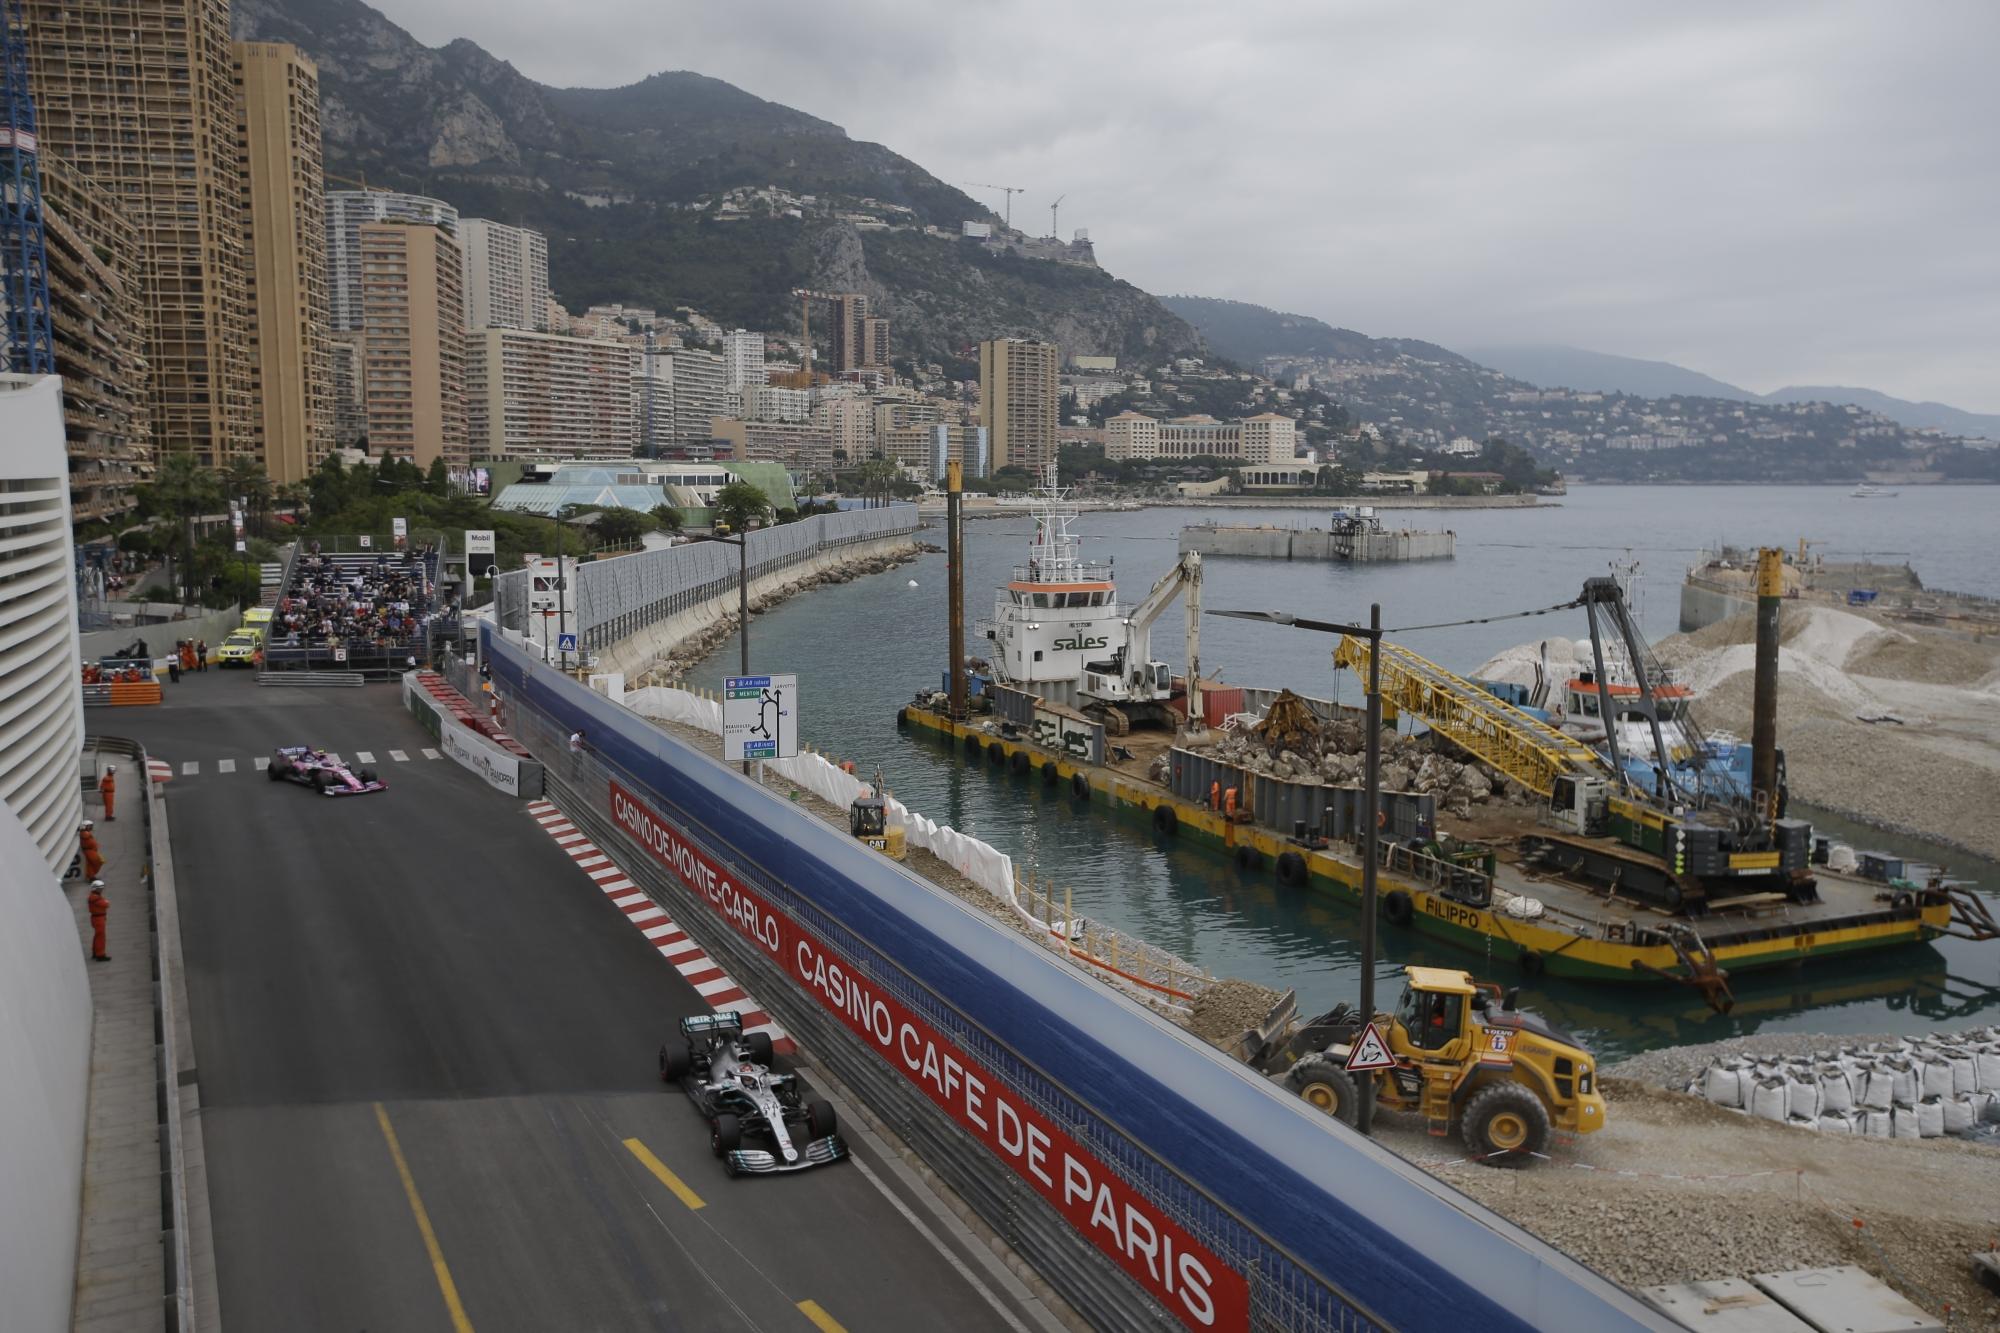 Hamilton Fastest For Mercedes In 1st Practice For Monaco